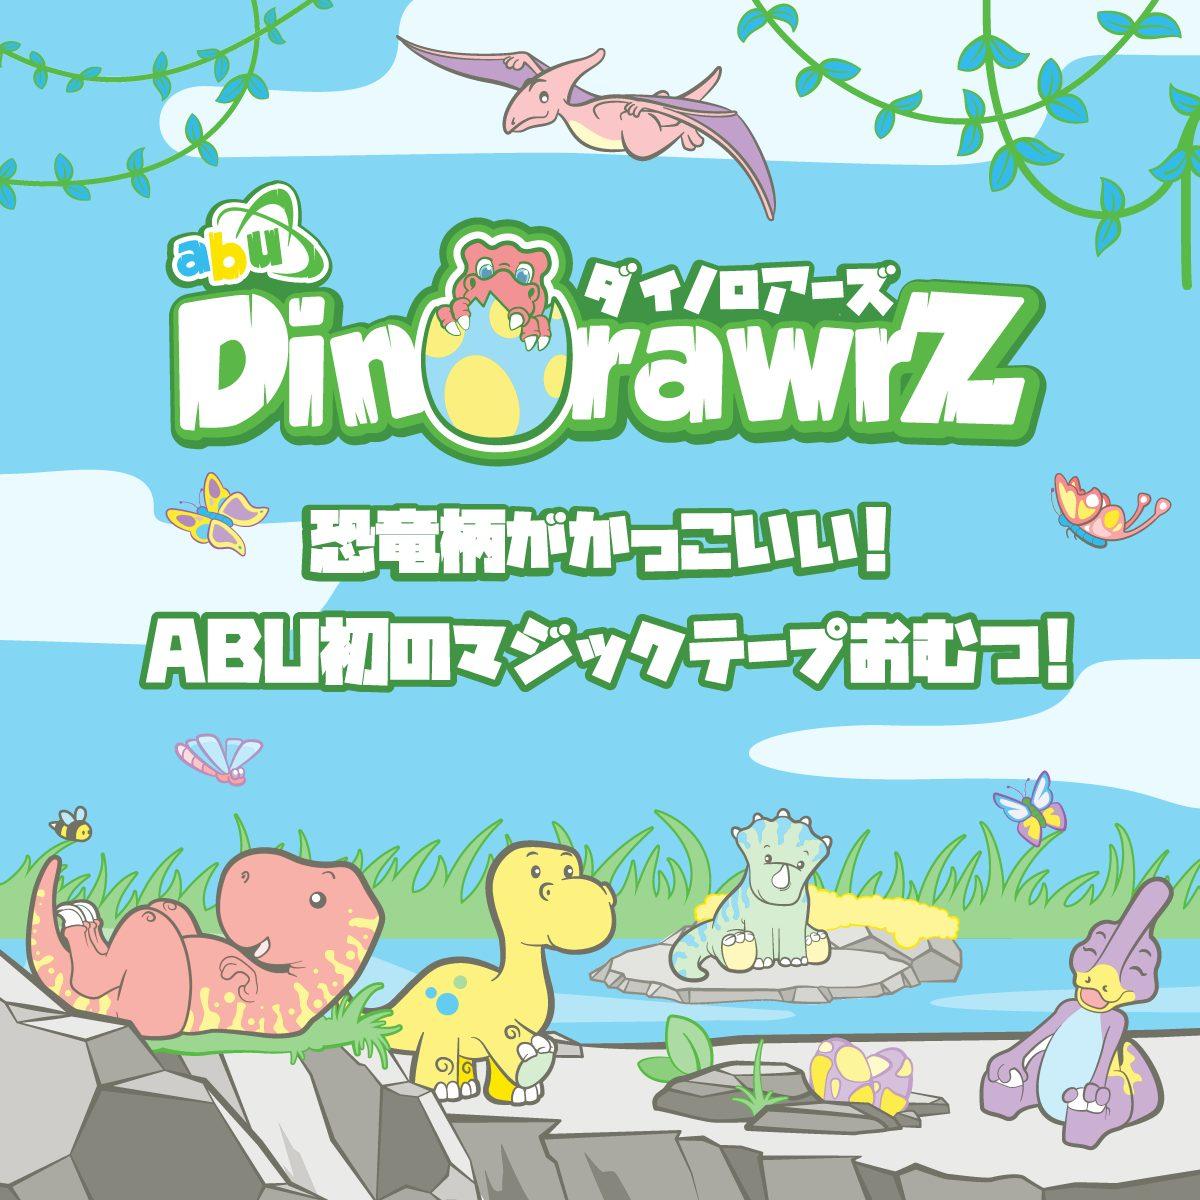 ABU DinoRawrZ Diapers